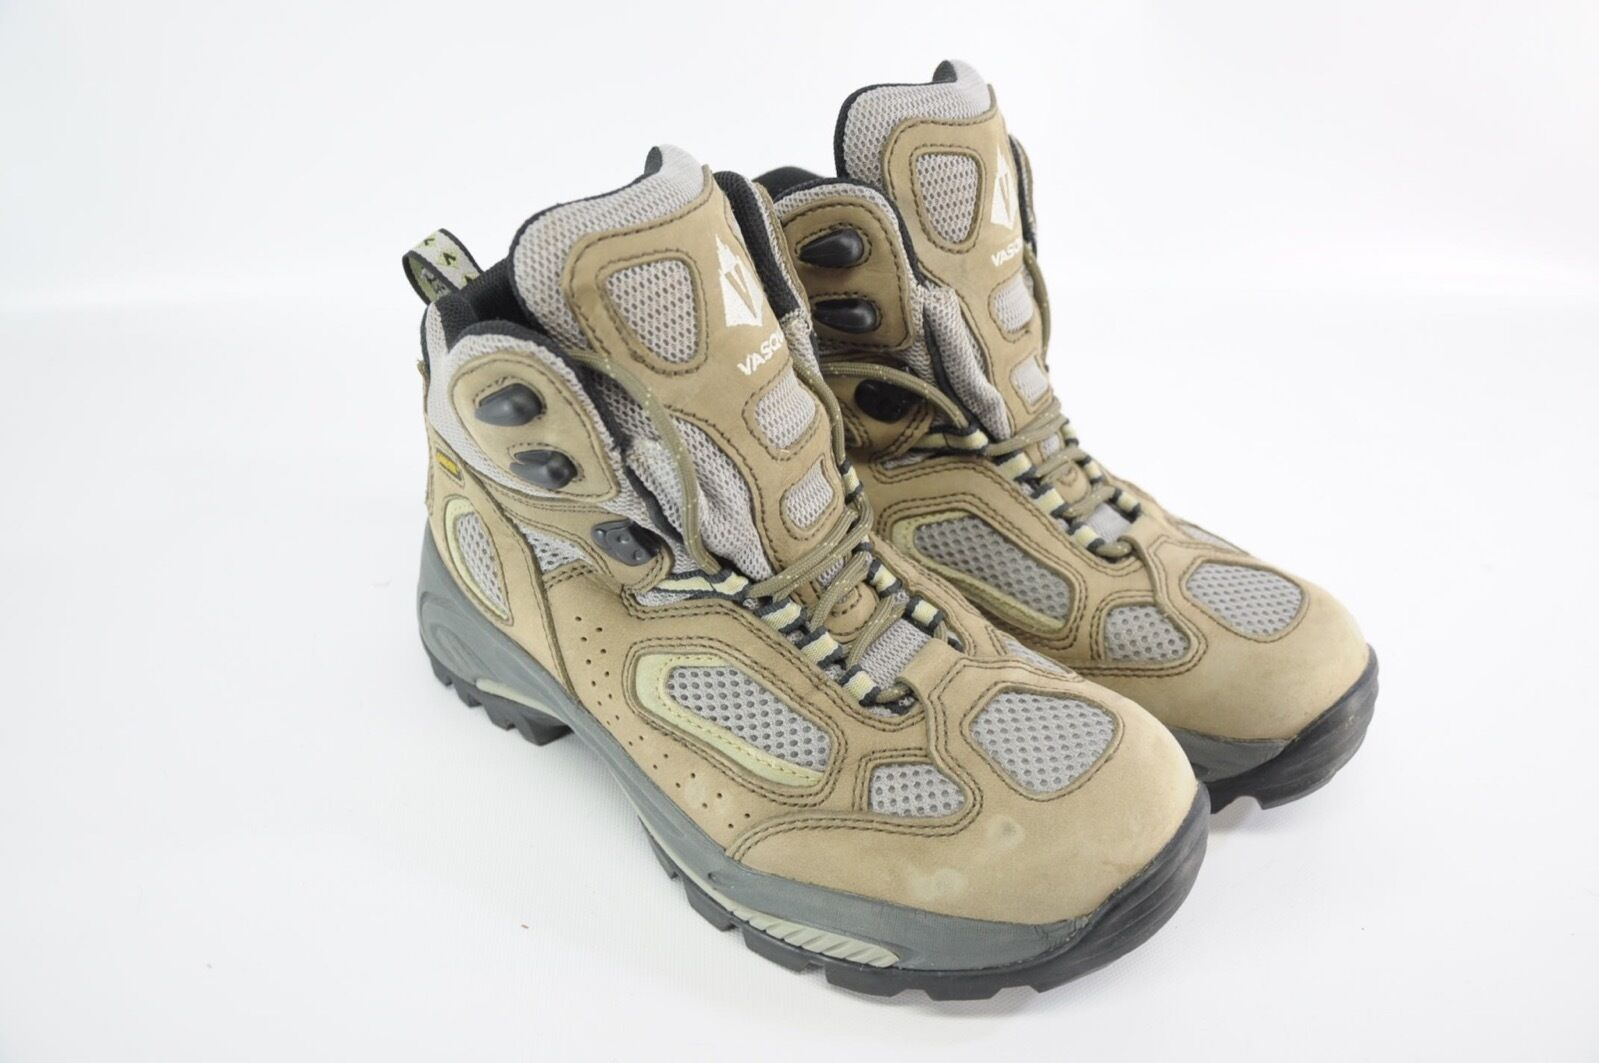 Vasque Breeze Mid GTX Gore Tex Waterproof Braun 9.5 Leder Vented Hiking Stiefel 9.5 Braun fa0f04